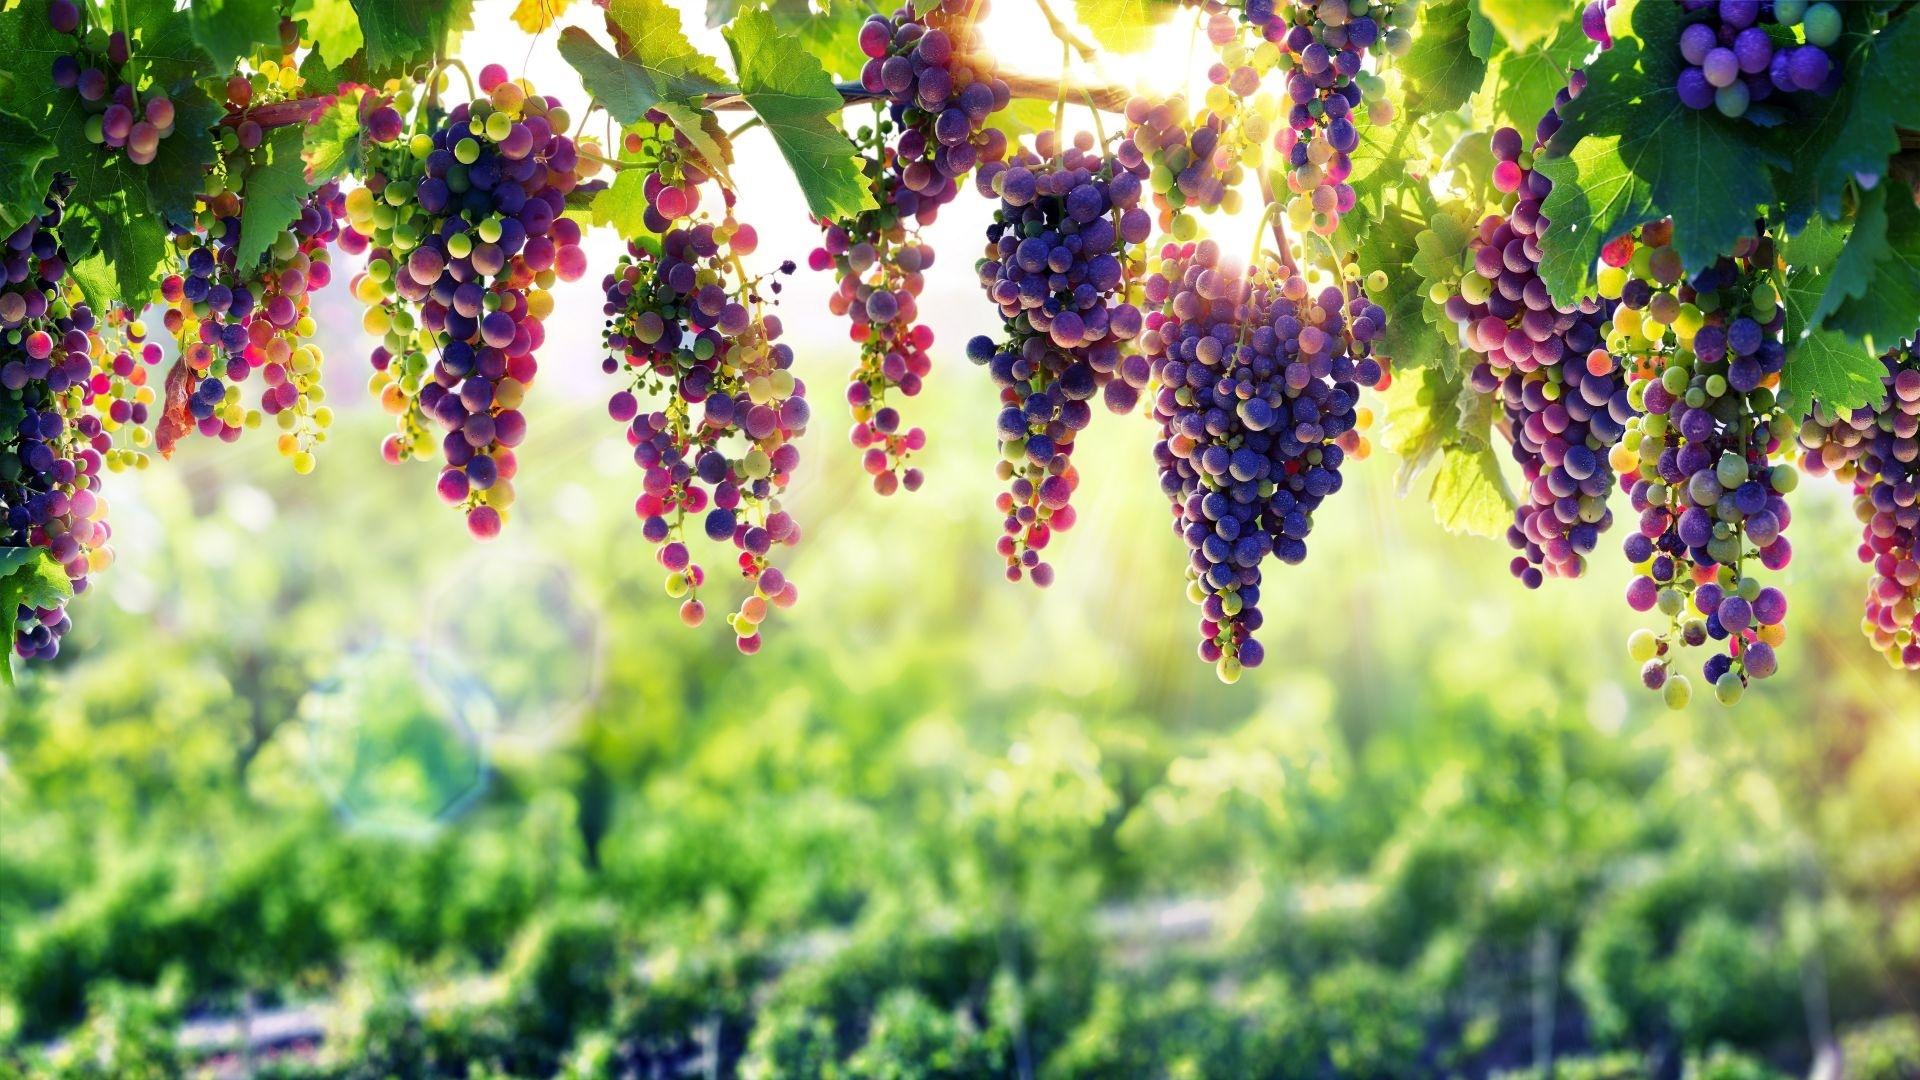 Vineyard desktop background